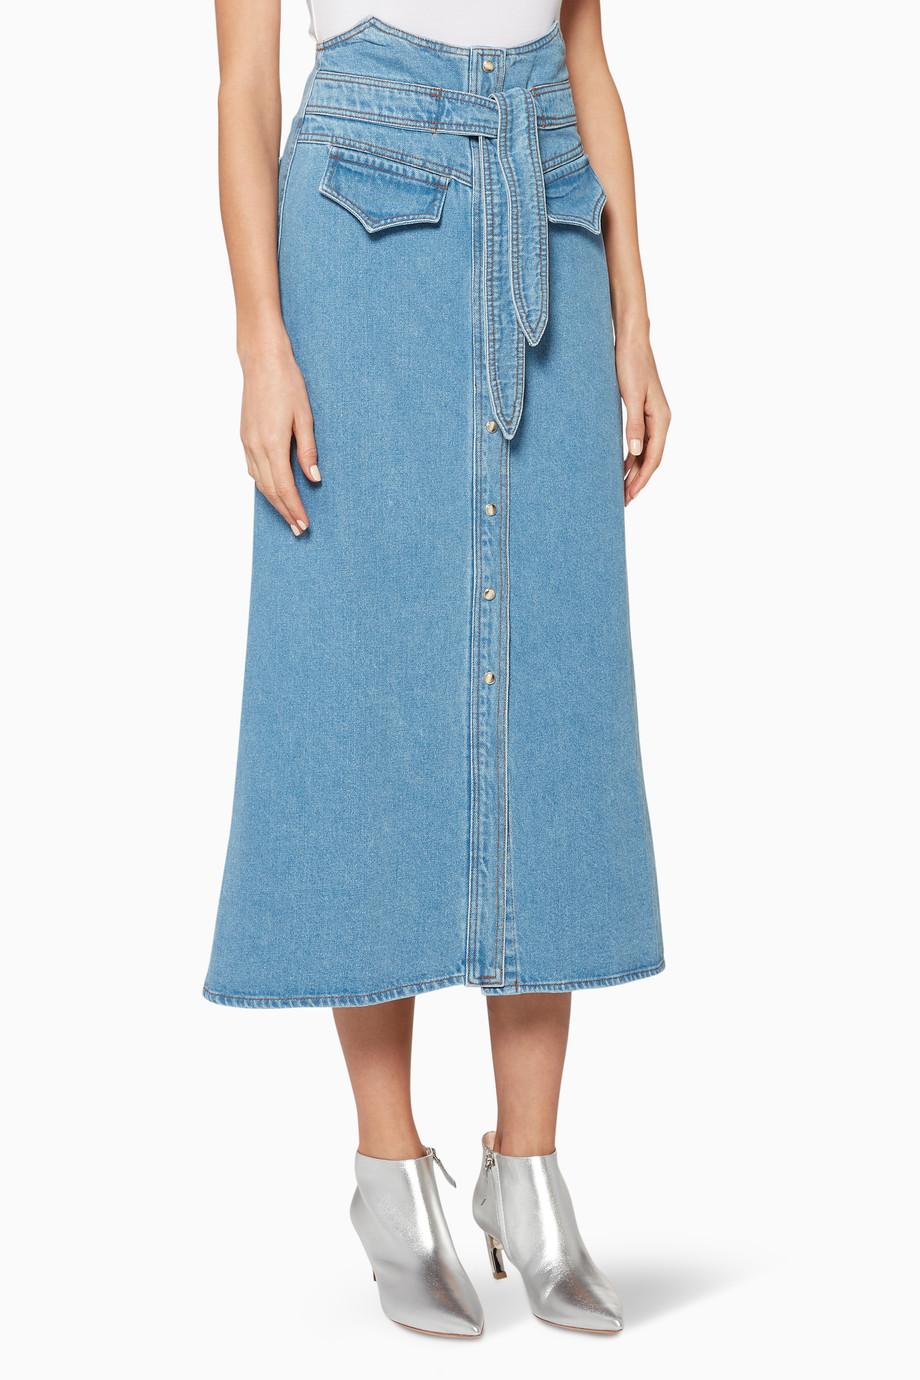 9ba8af2cd تسوق تنورة ألما دينم متوسطة الطول زرقاء NANUSHKA أزرق للنساء | اُناس ...